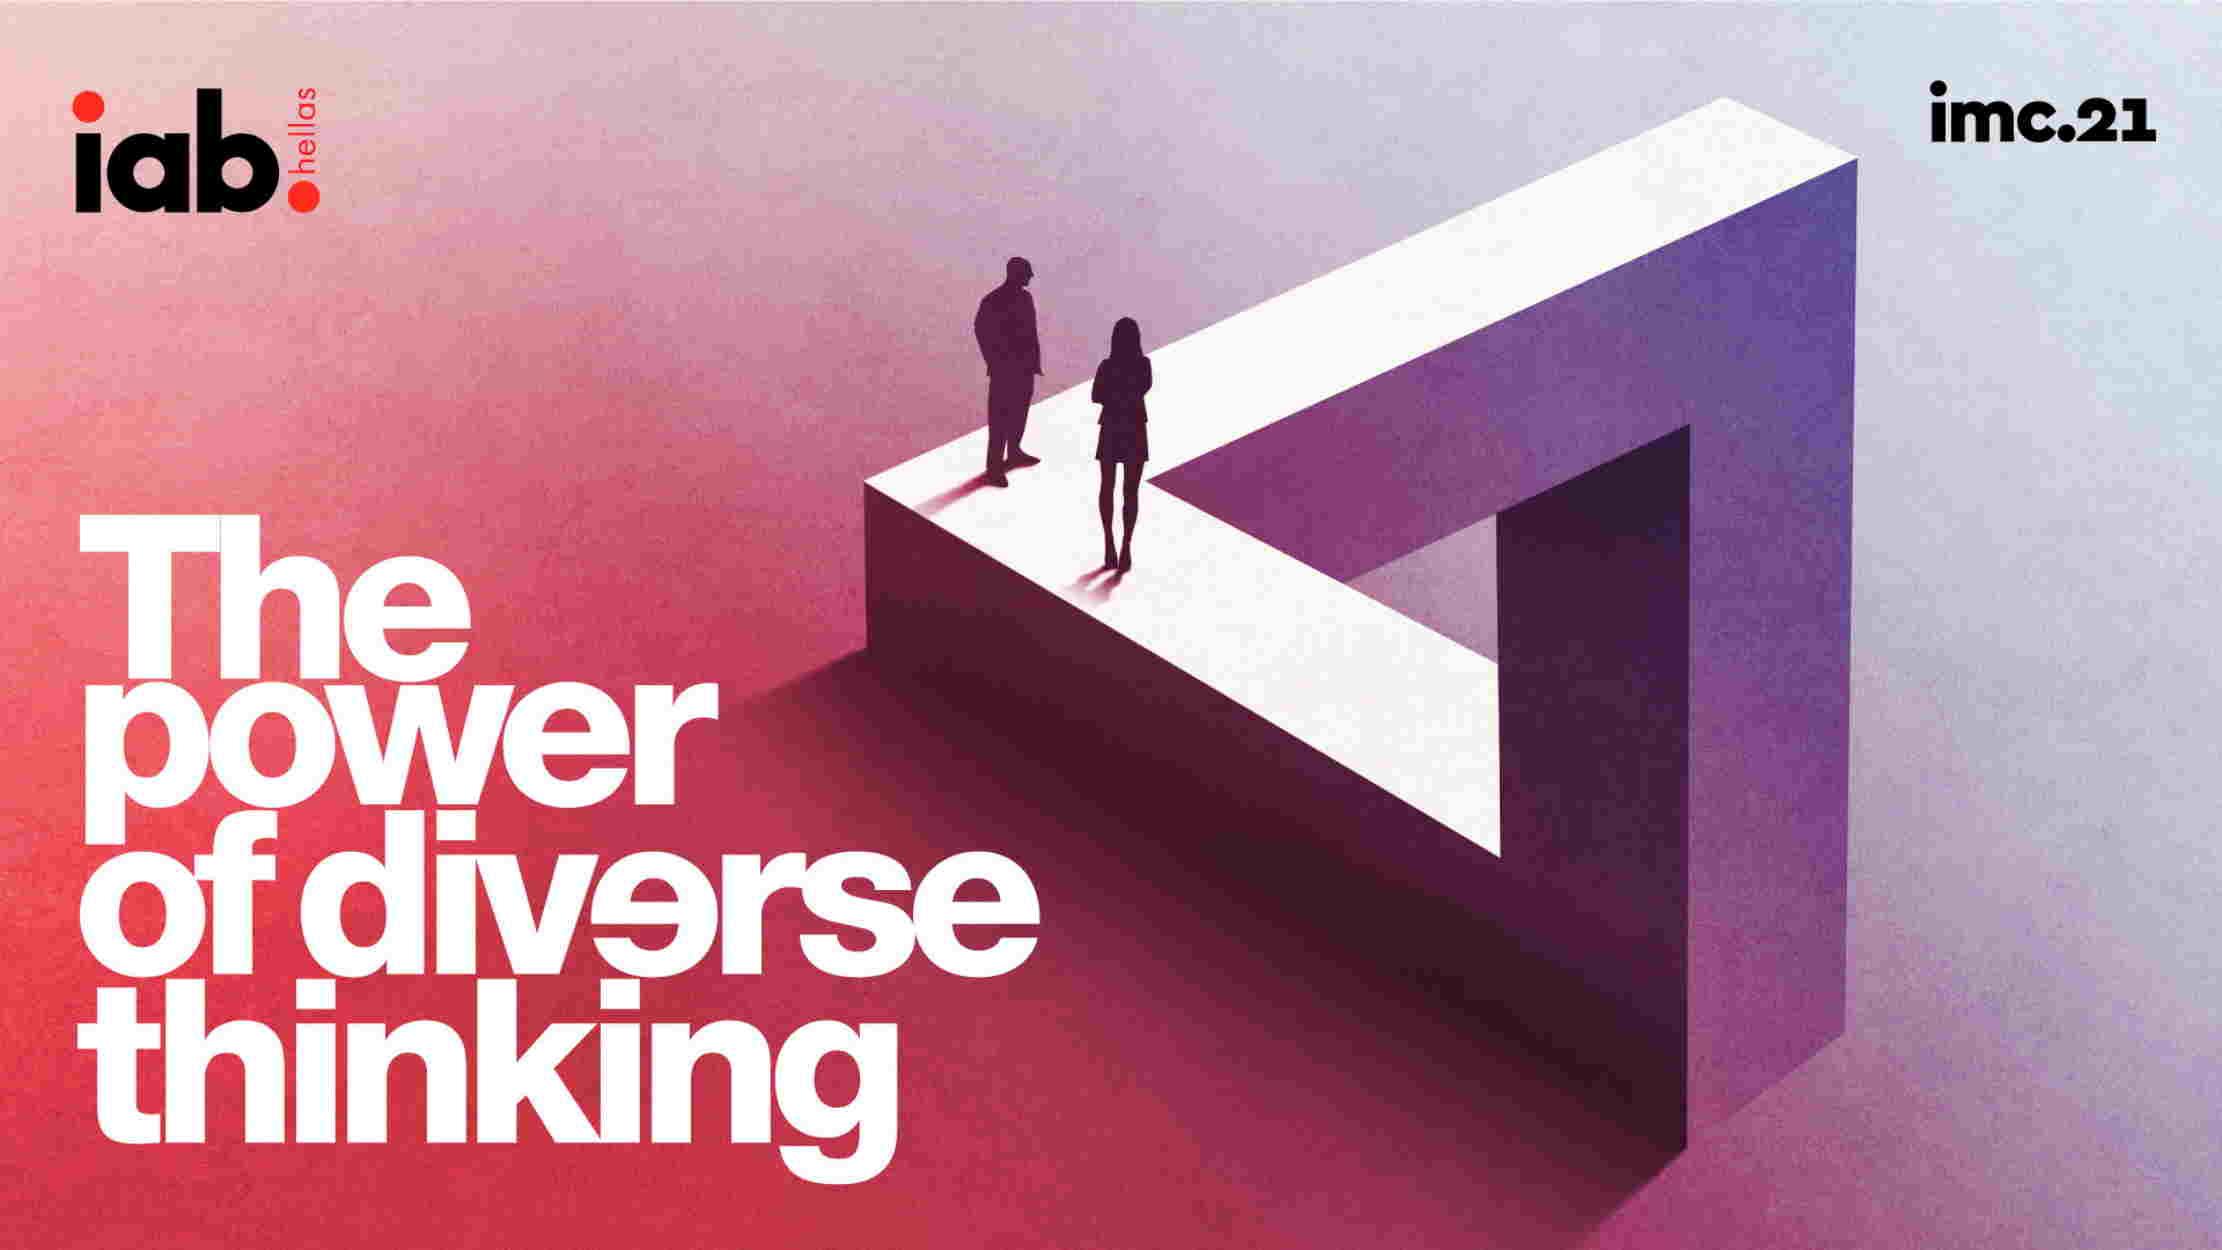 LIVE: Παρακολουθήστε δωρεάν το 1ο event του IMC 201 για τη Διαφήμιση και την Επικοινωνία